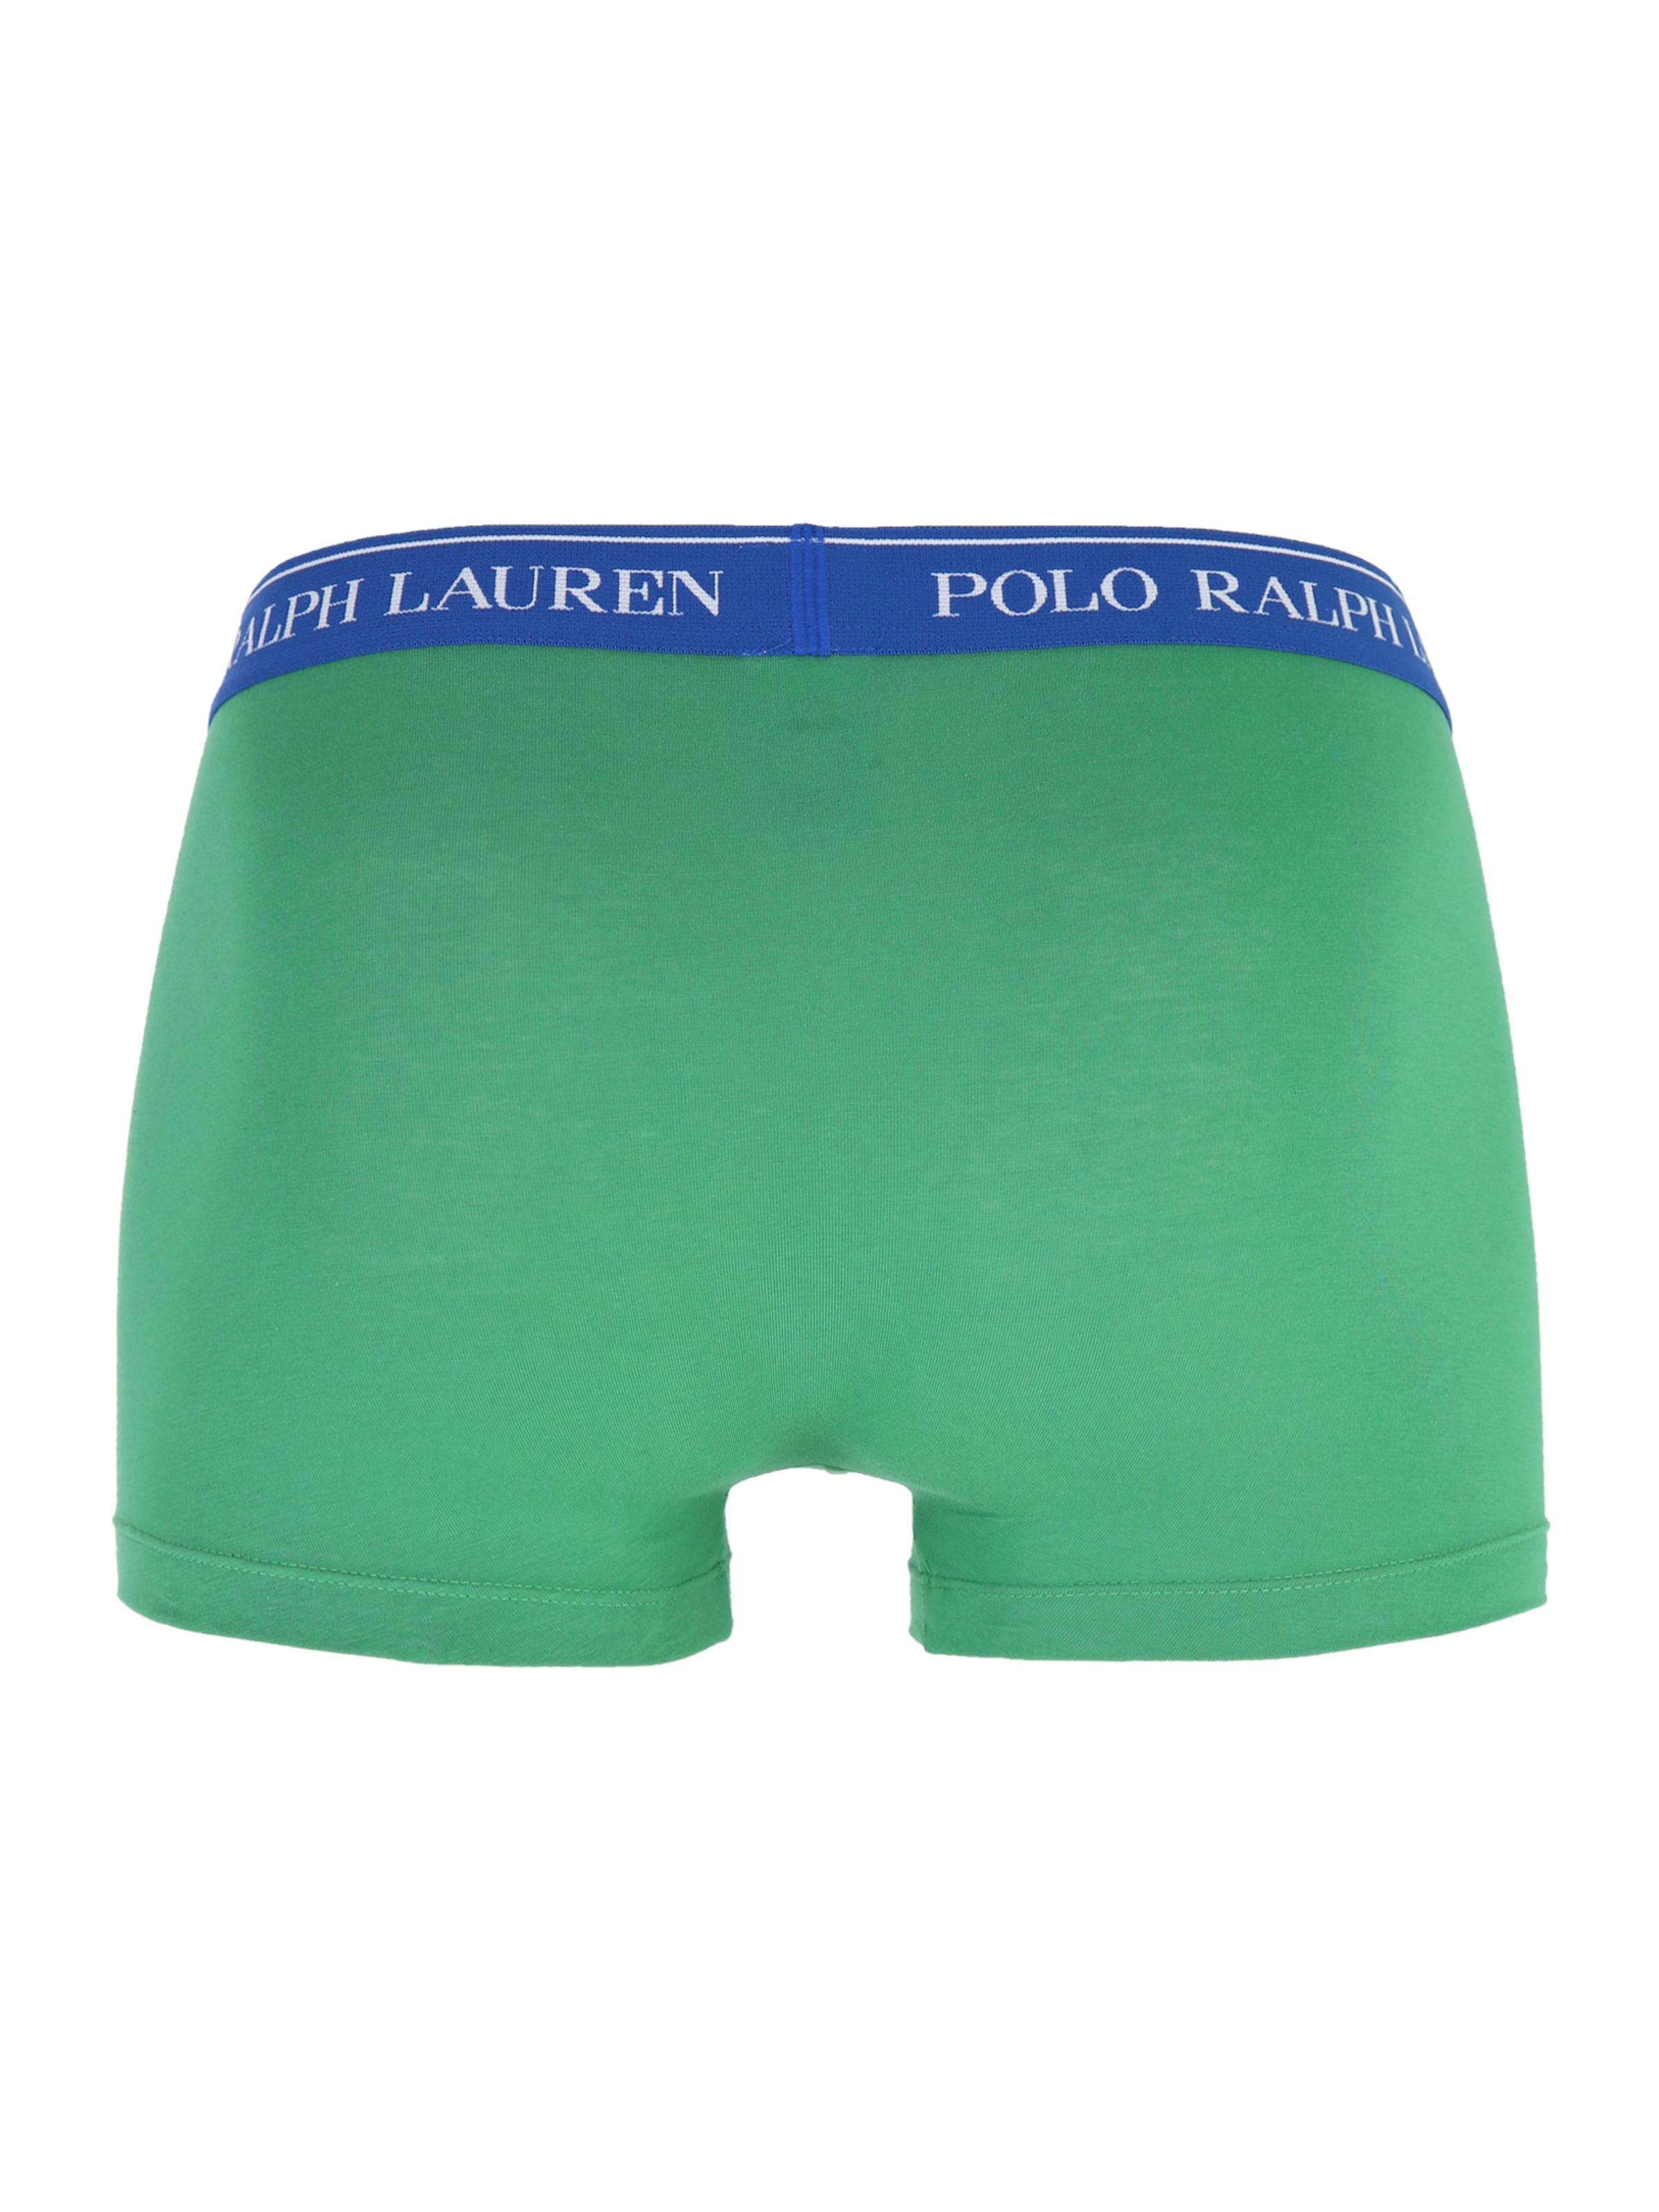 BleuMarine Blanc En Polo Lauren Ralph Boxers zVSUMp